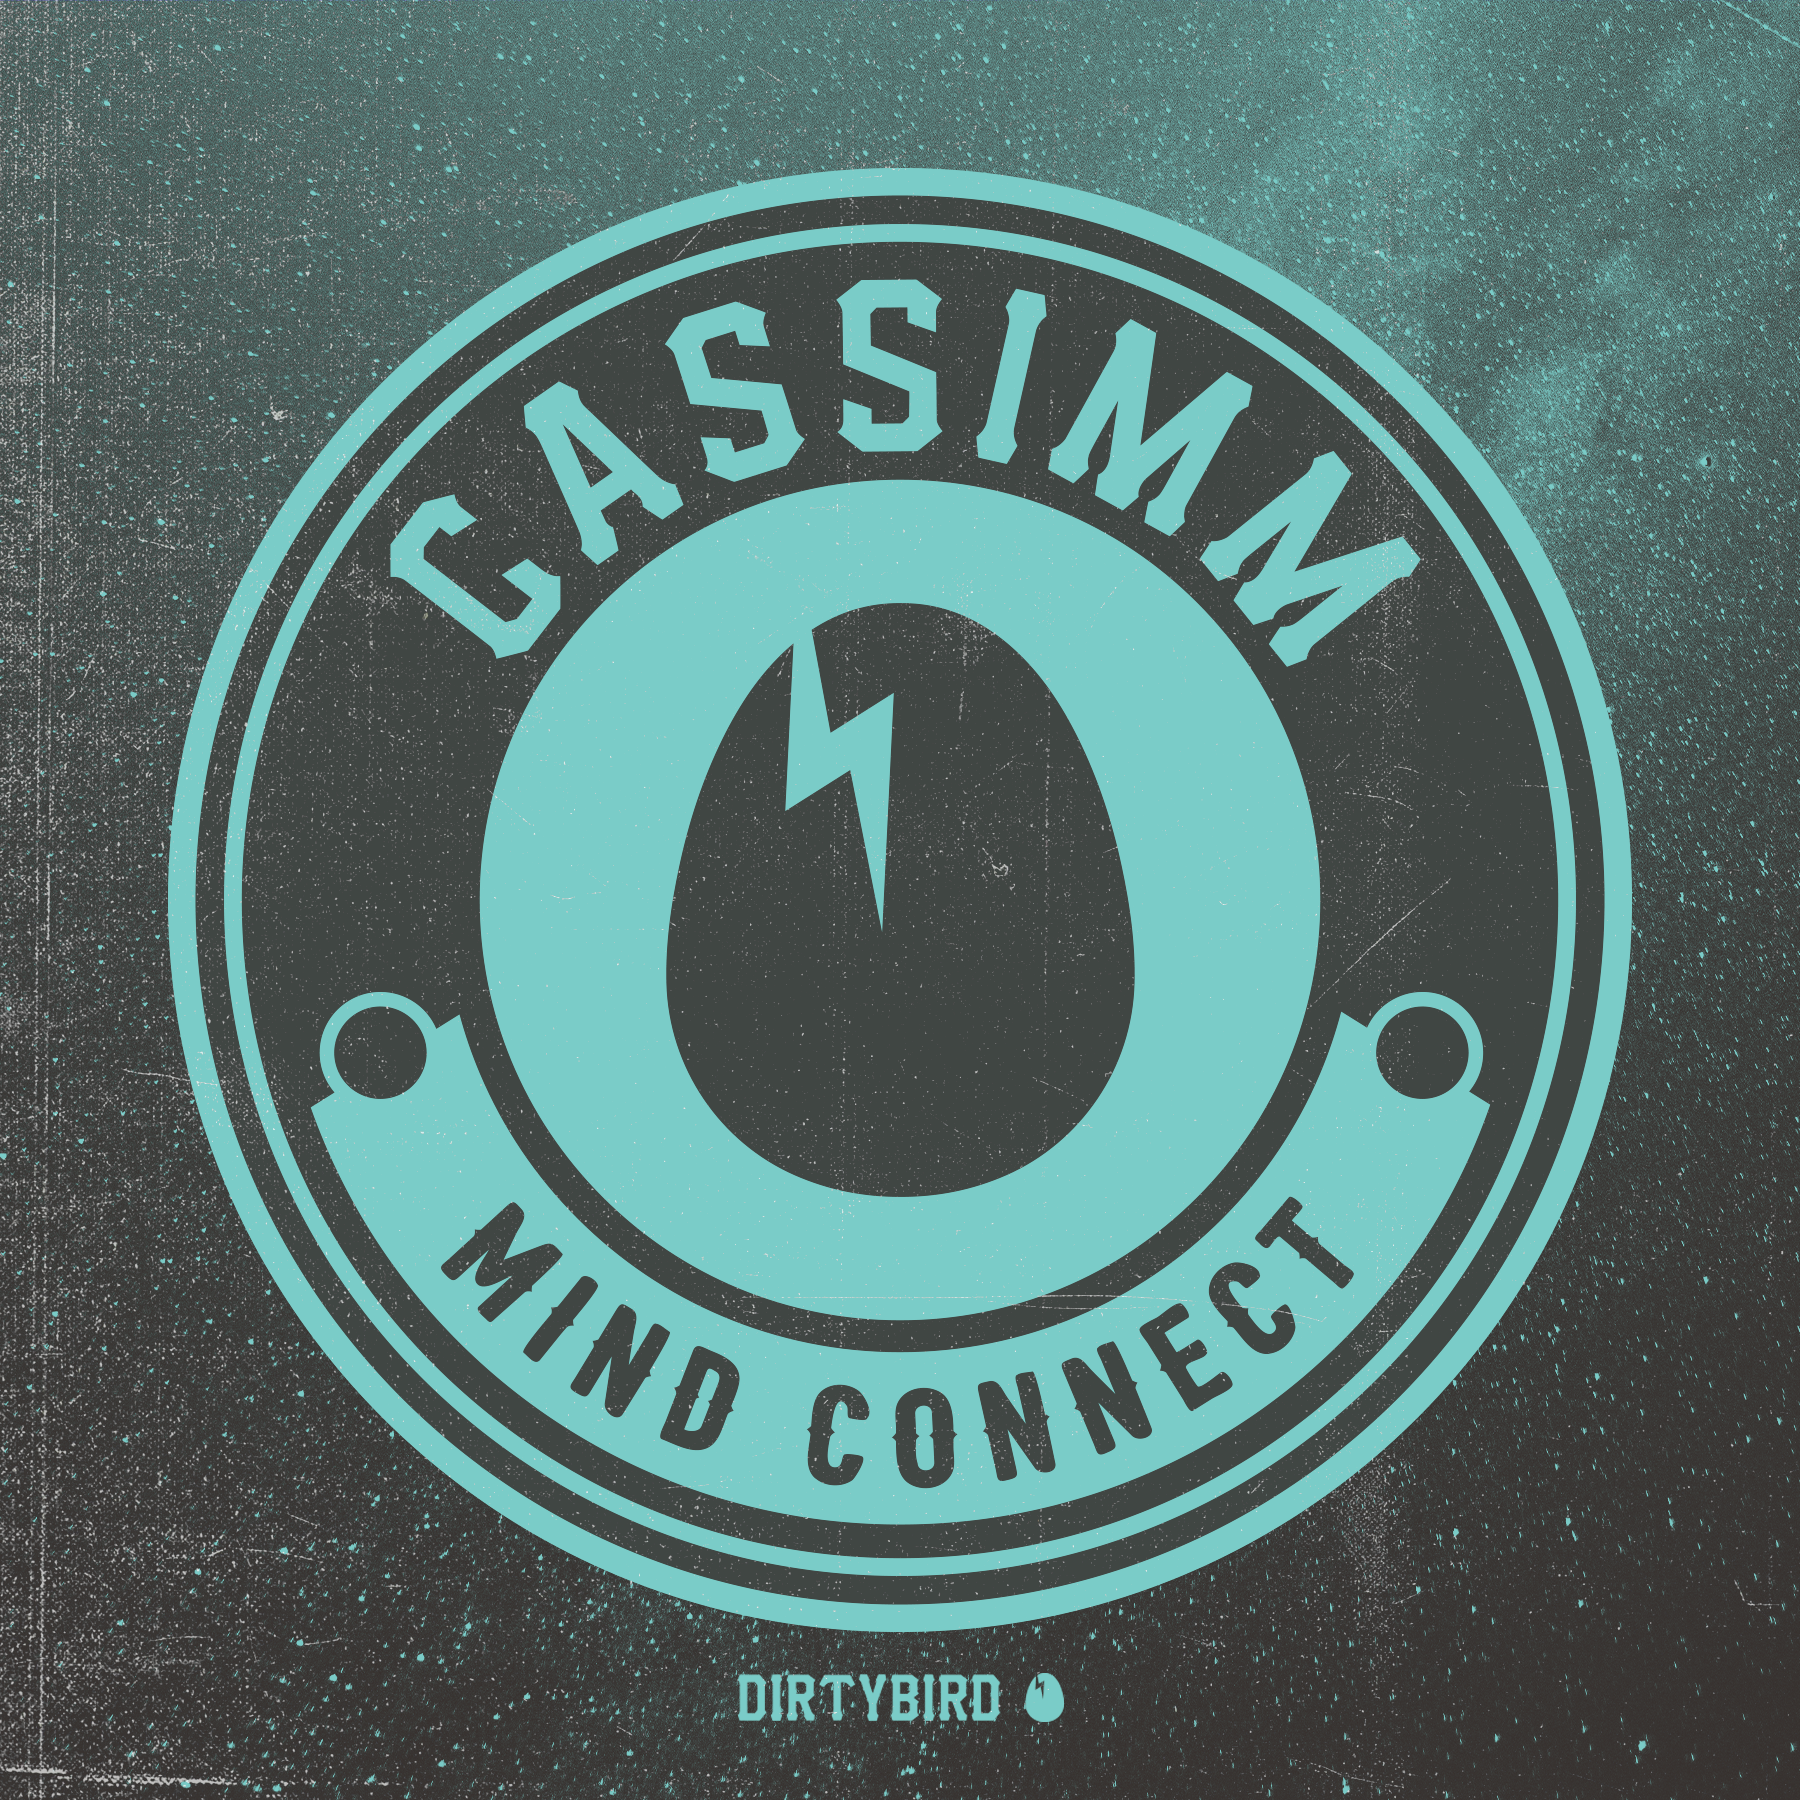 Birdfeed cassimm mindconnect